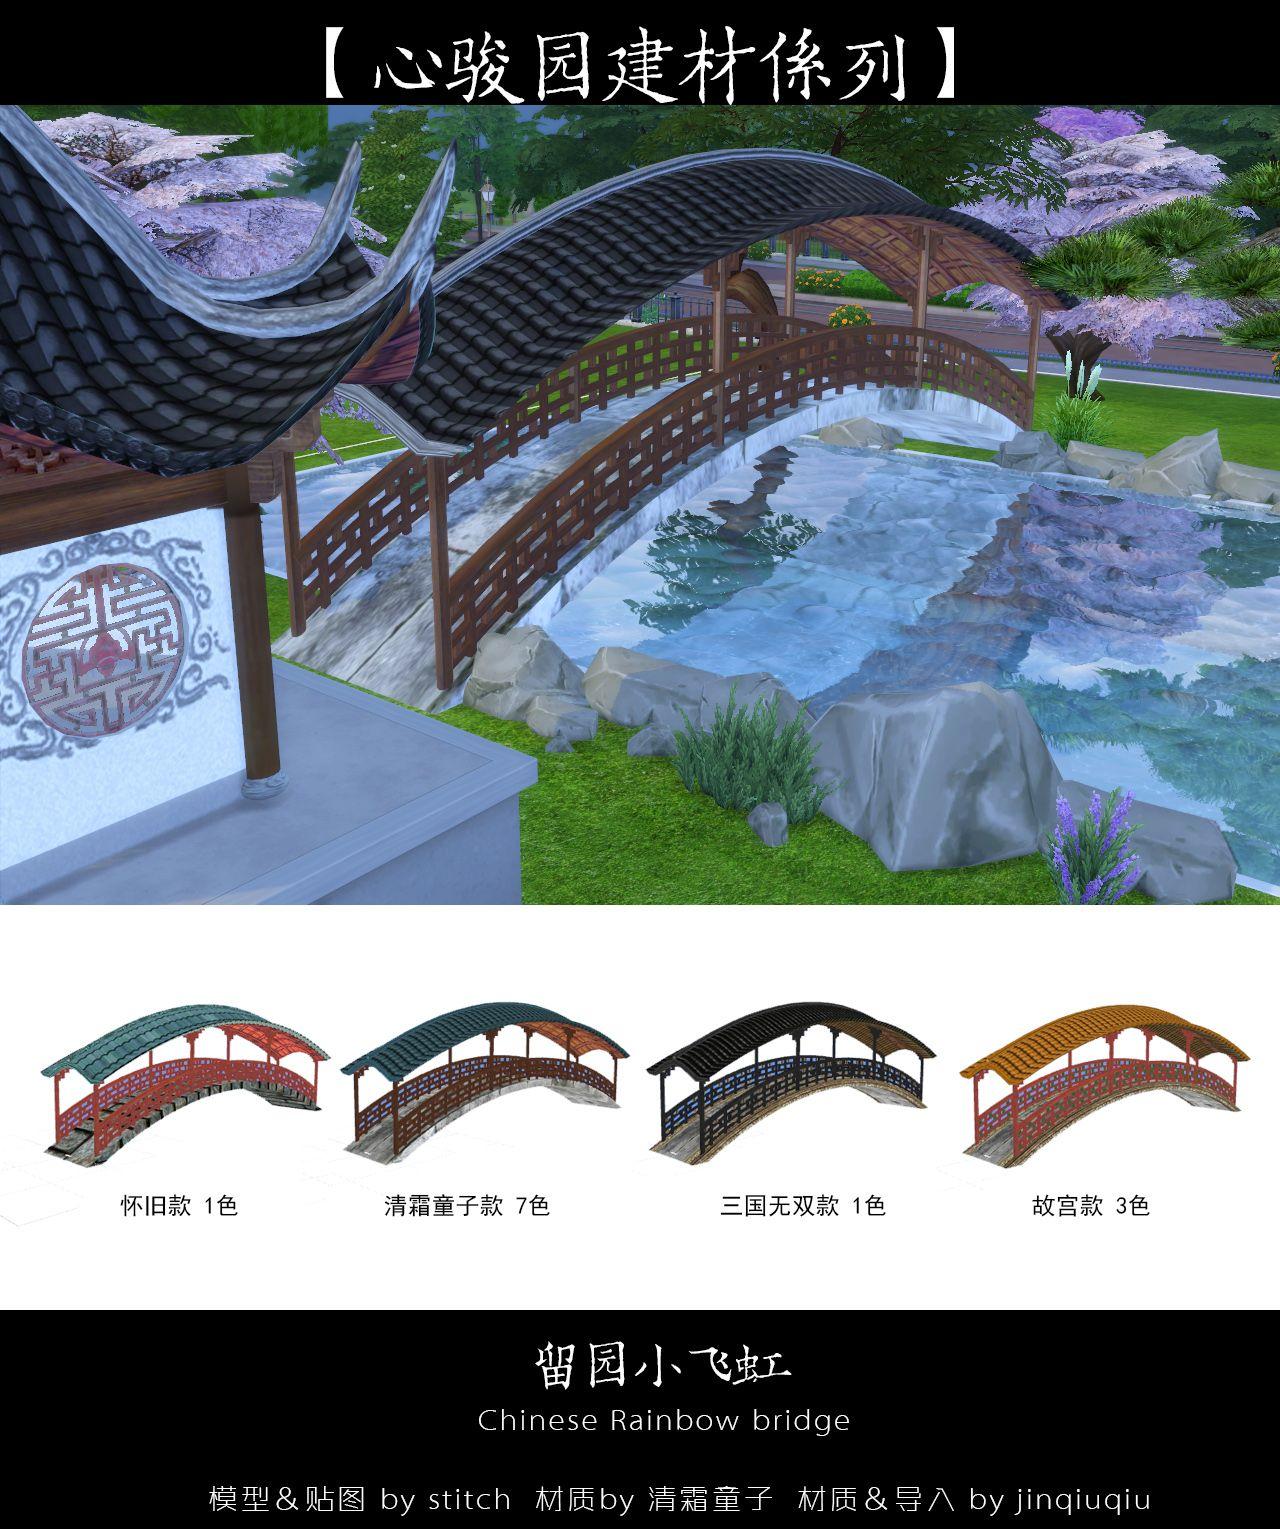 Sims 4 Chinese style bridge Sims 4, Sims 4 mods, Sims 4